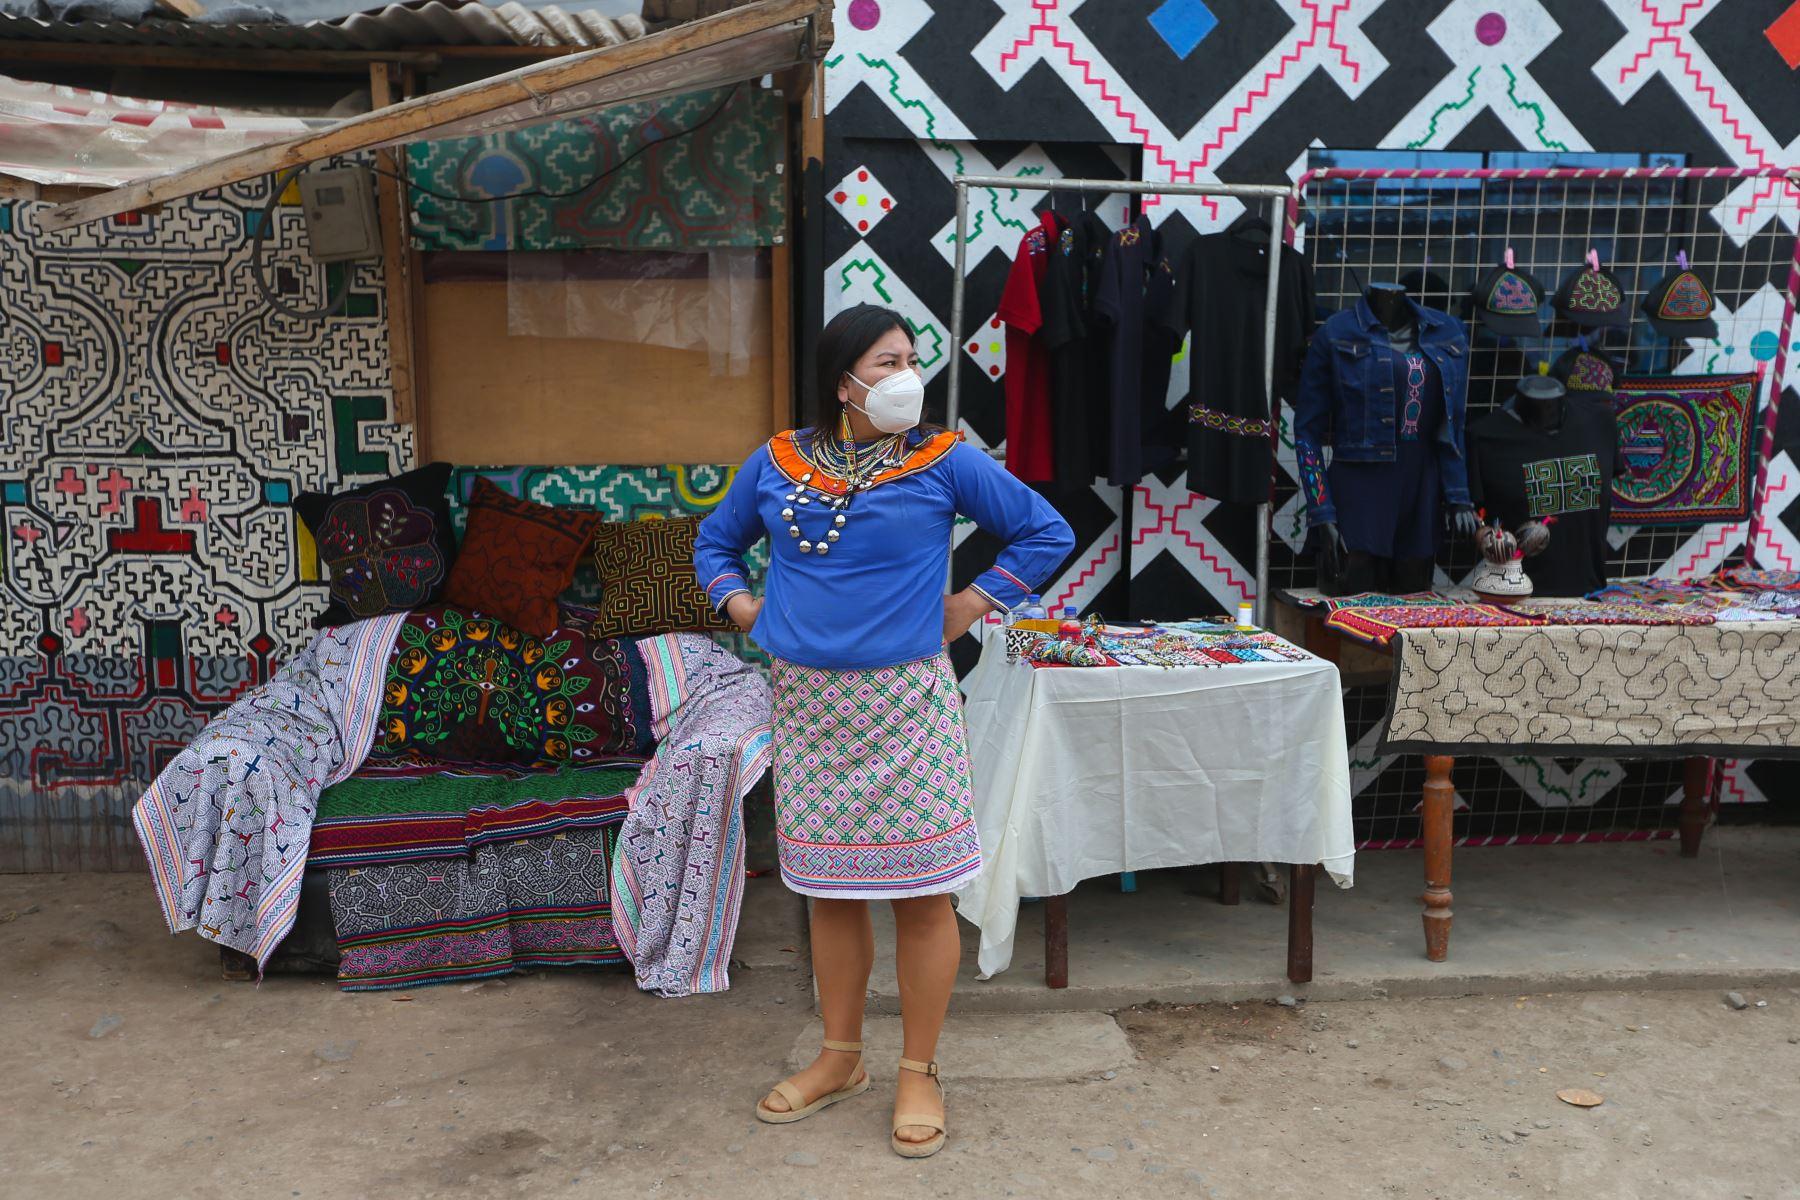 Comunidad Shipibo Konibo de Cantagallo presentó artesanías que ofrece a través del portal web de Ruraq Maki. Foto: ANDINA/Jhonel Rodríguez Robles